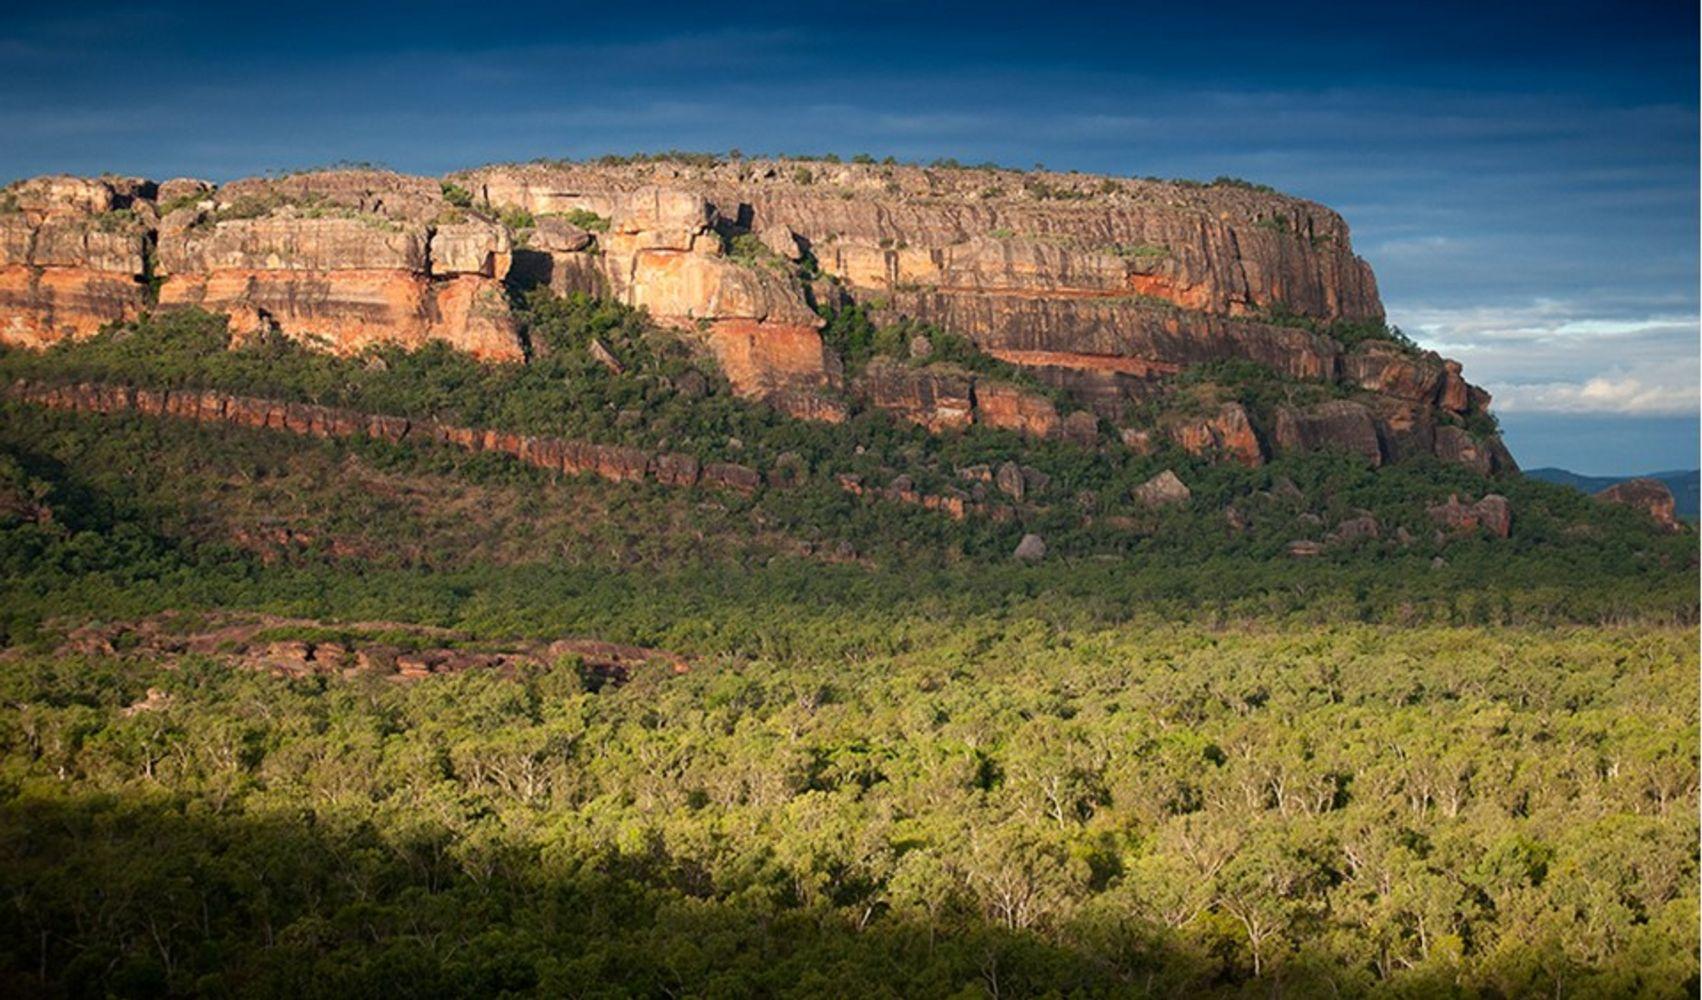 Nourlangie Rock Kakadu National Park, Australia - 2023 solar eclipse tour